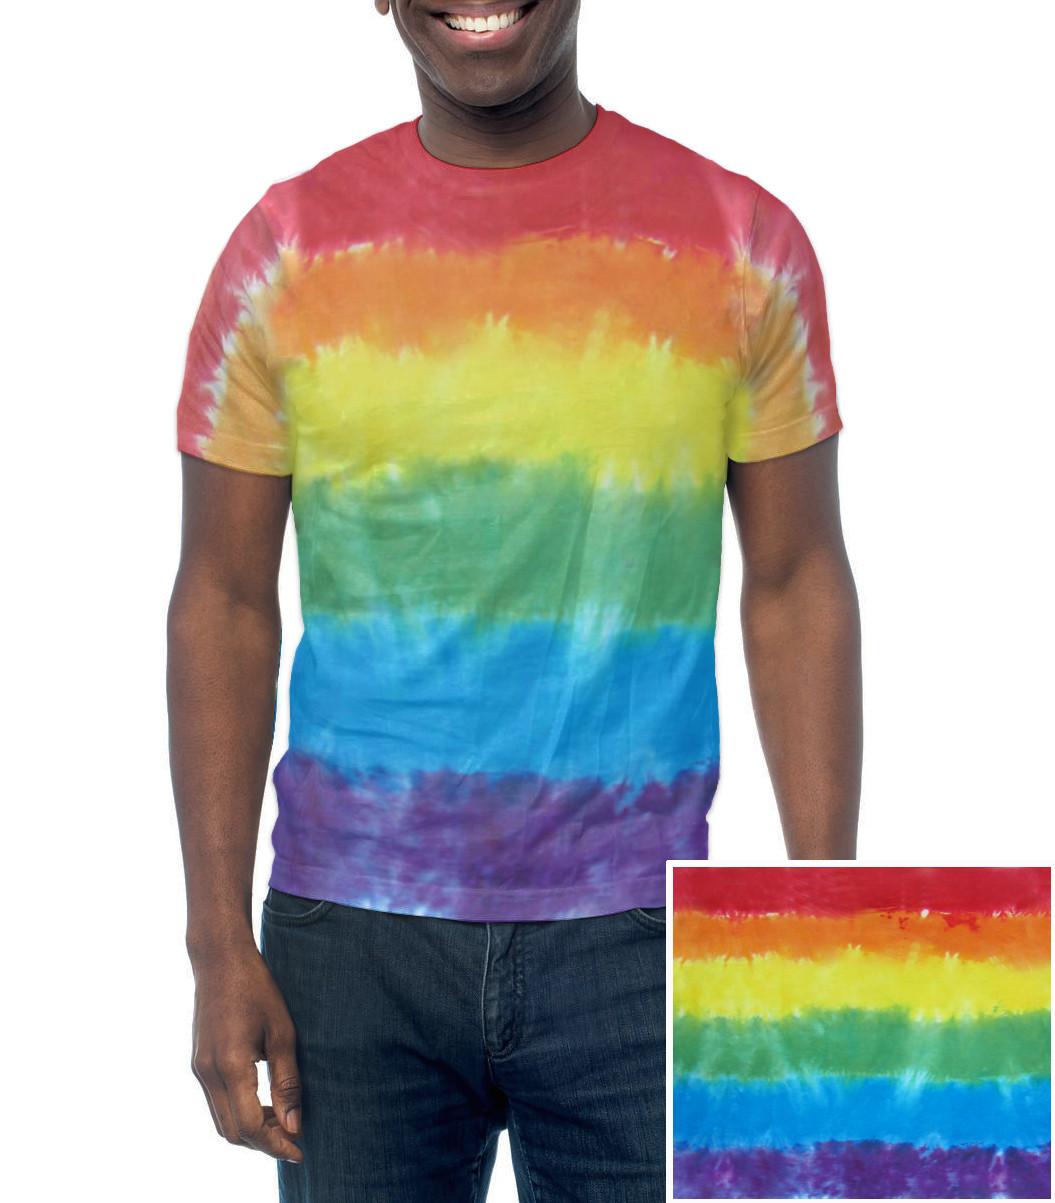 6bad18cfb5 Rainbow Flag Tie Dye T-Shirt - Handmade & Unique - LGBT Lesbian and ...